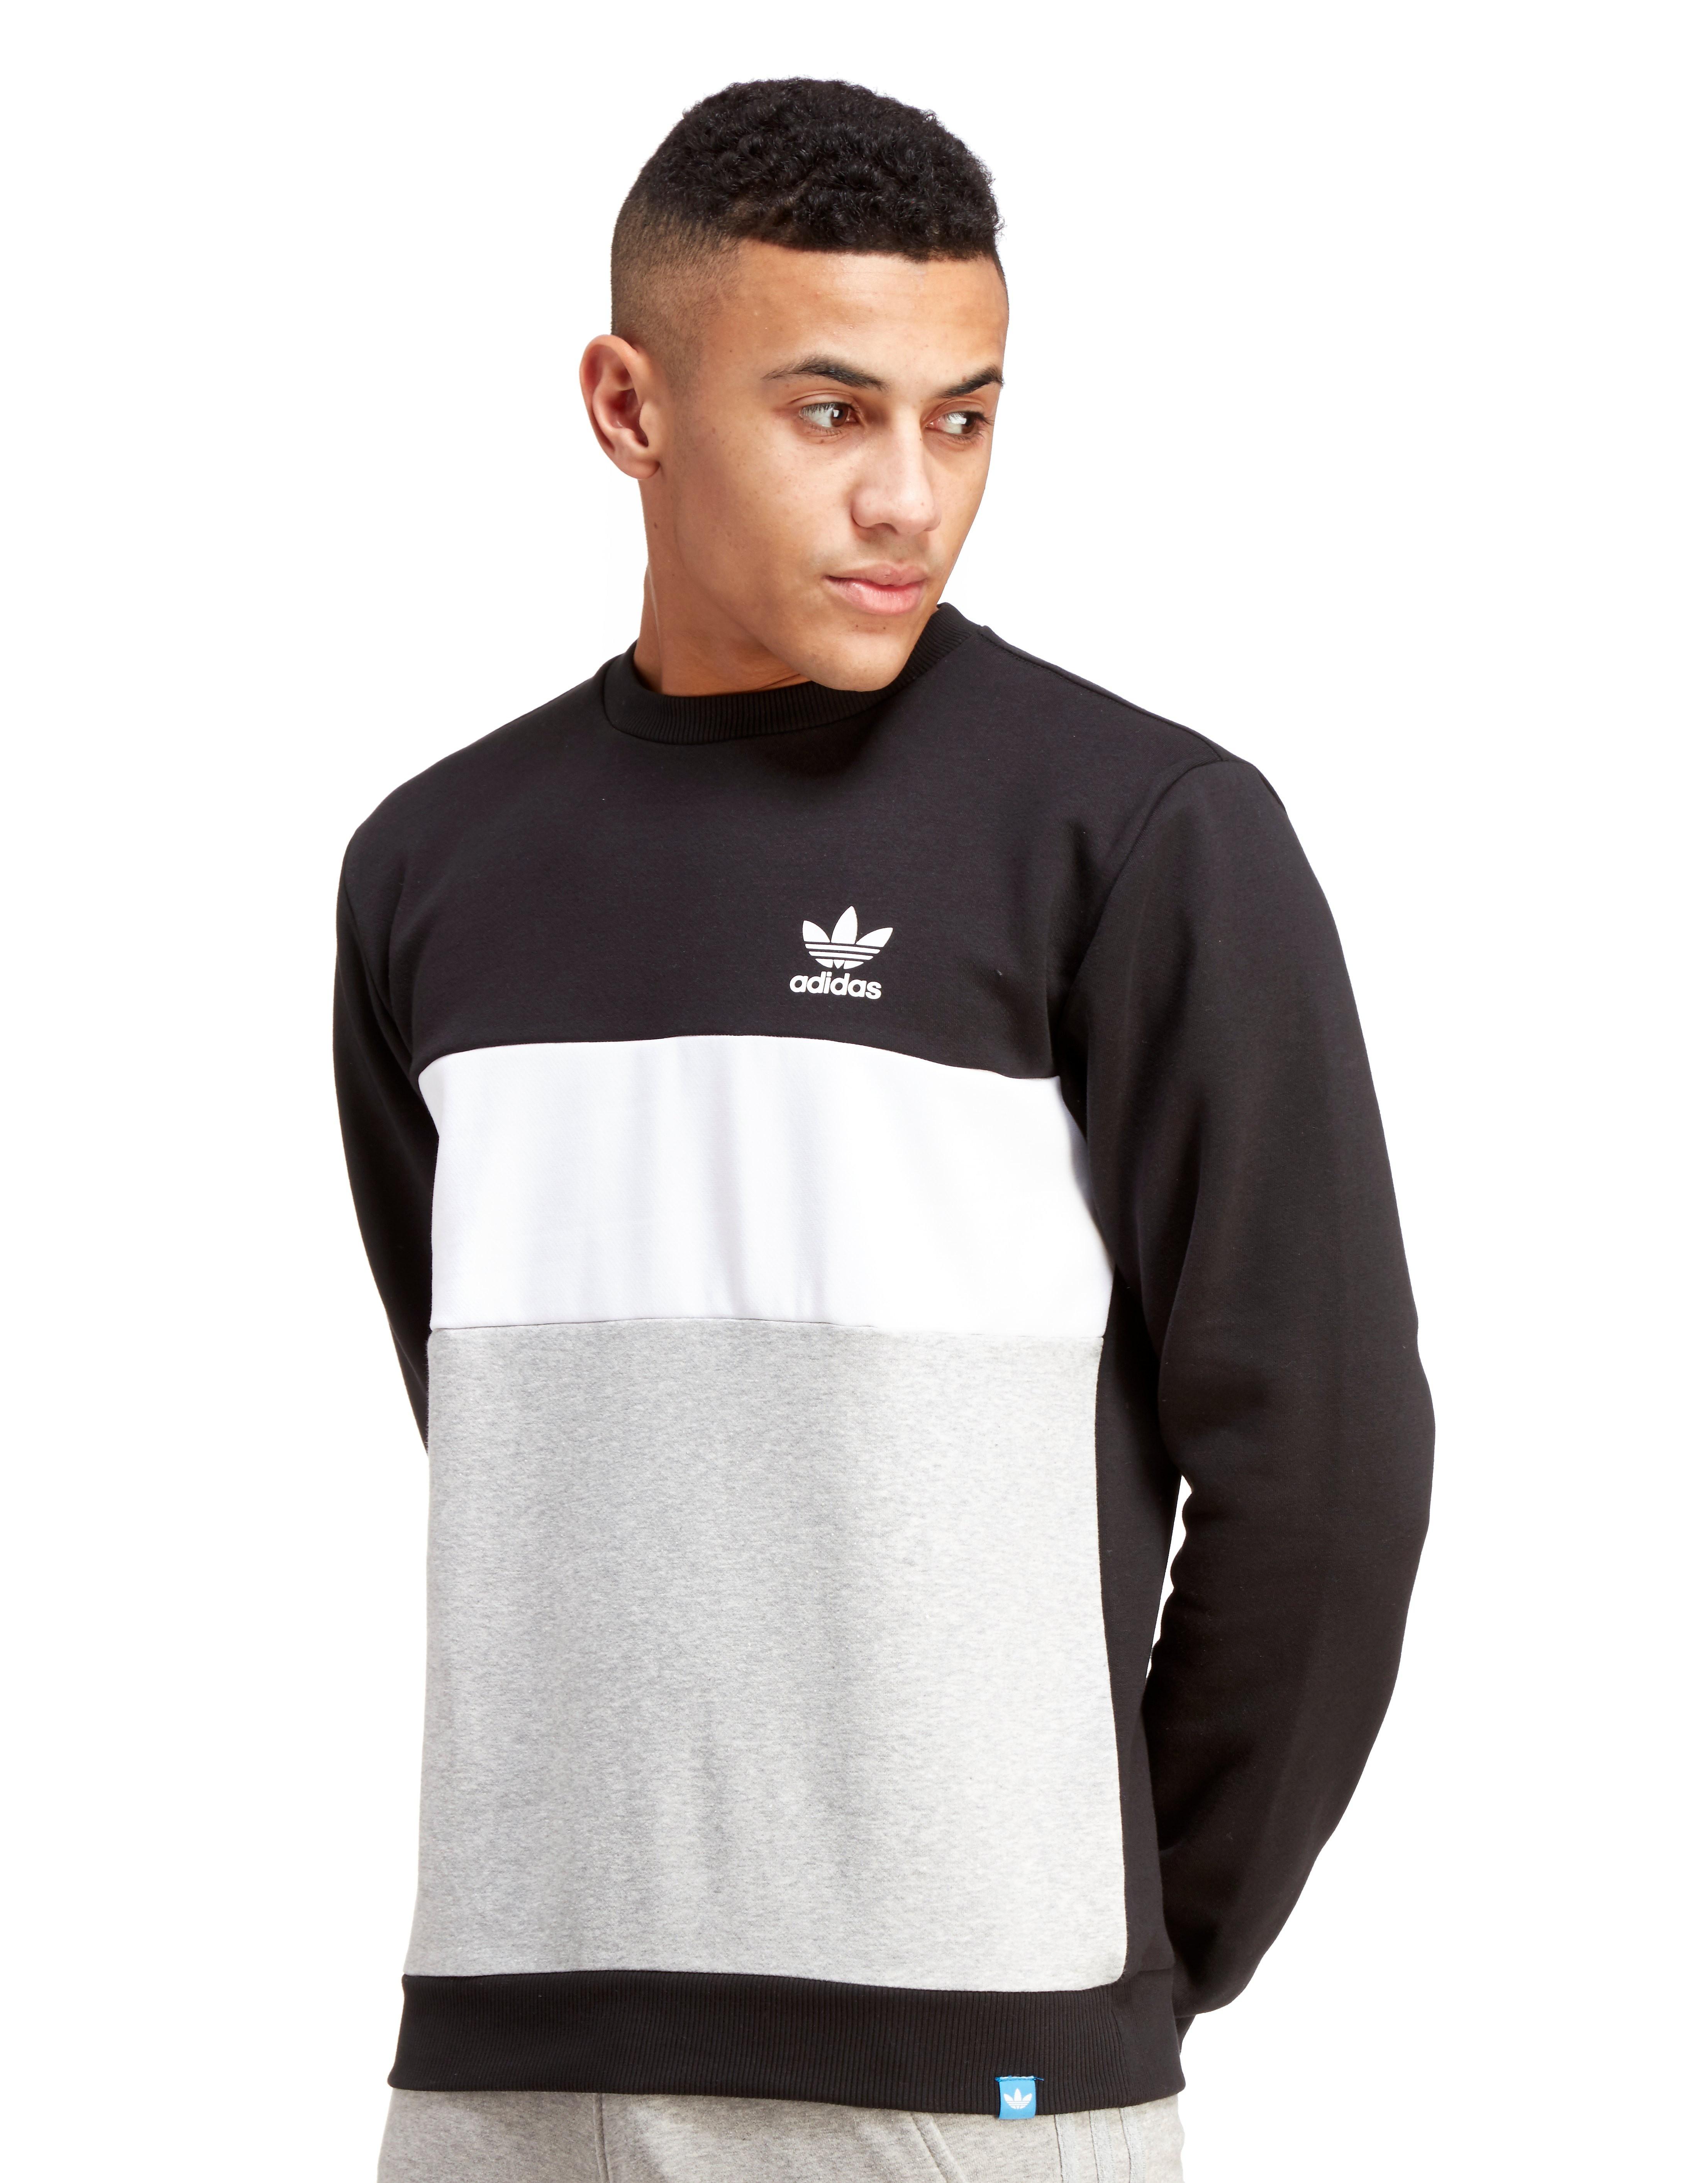 adidas Originals Trefoil Panel Sweatshirt